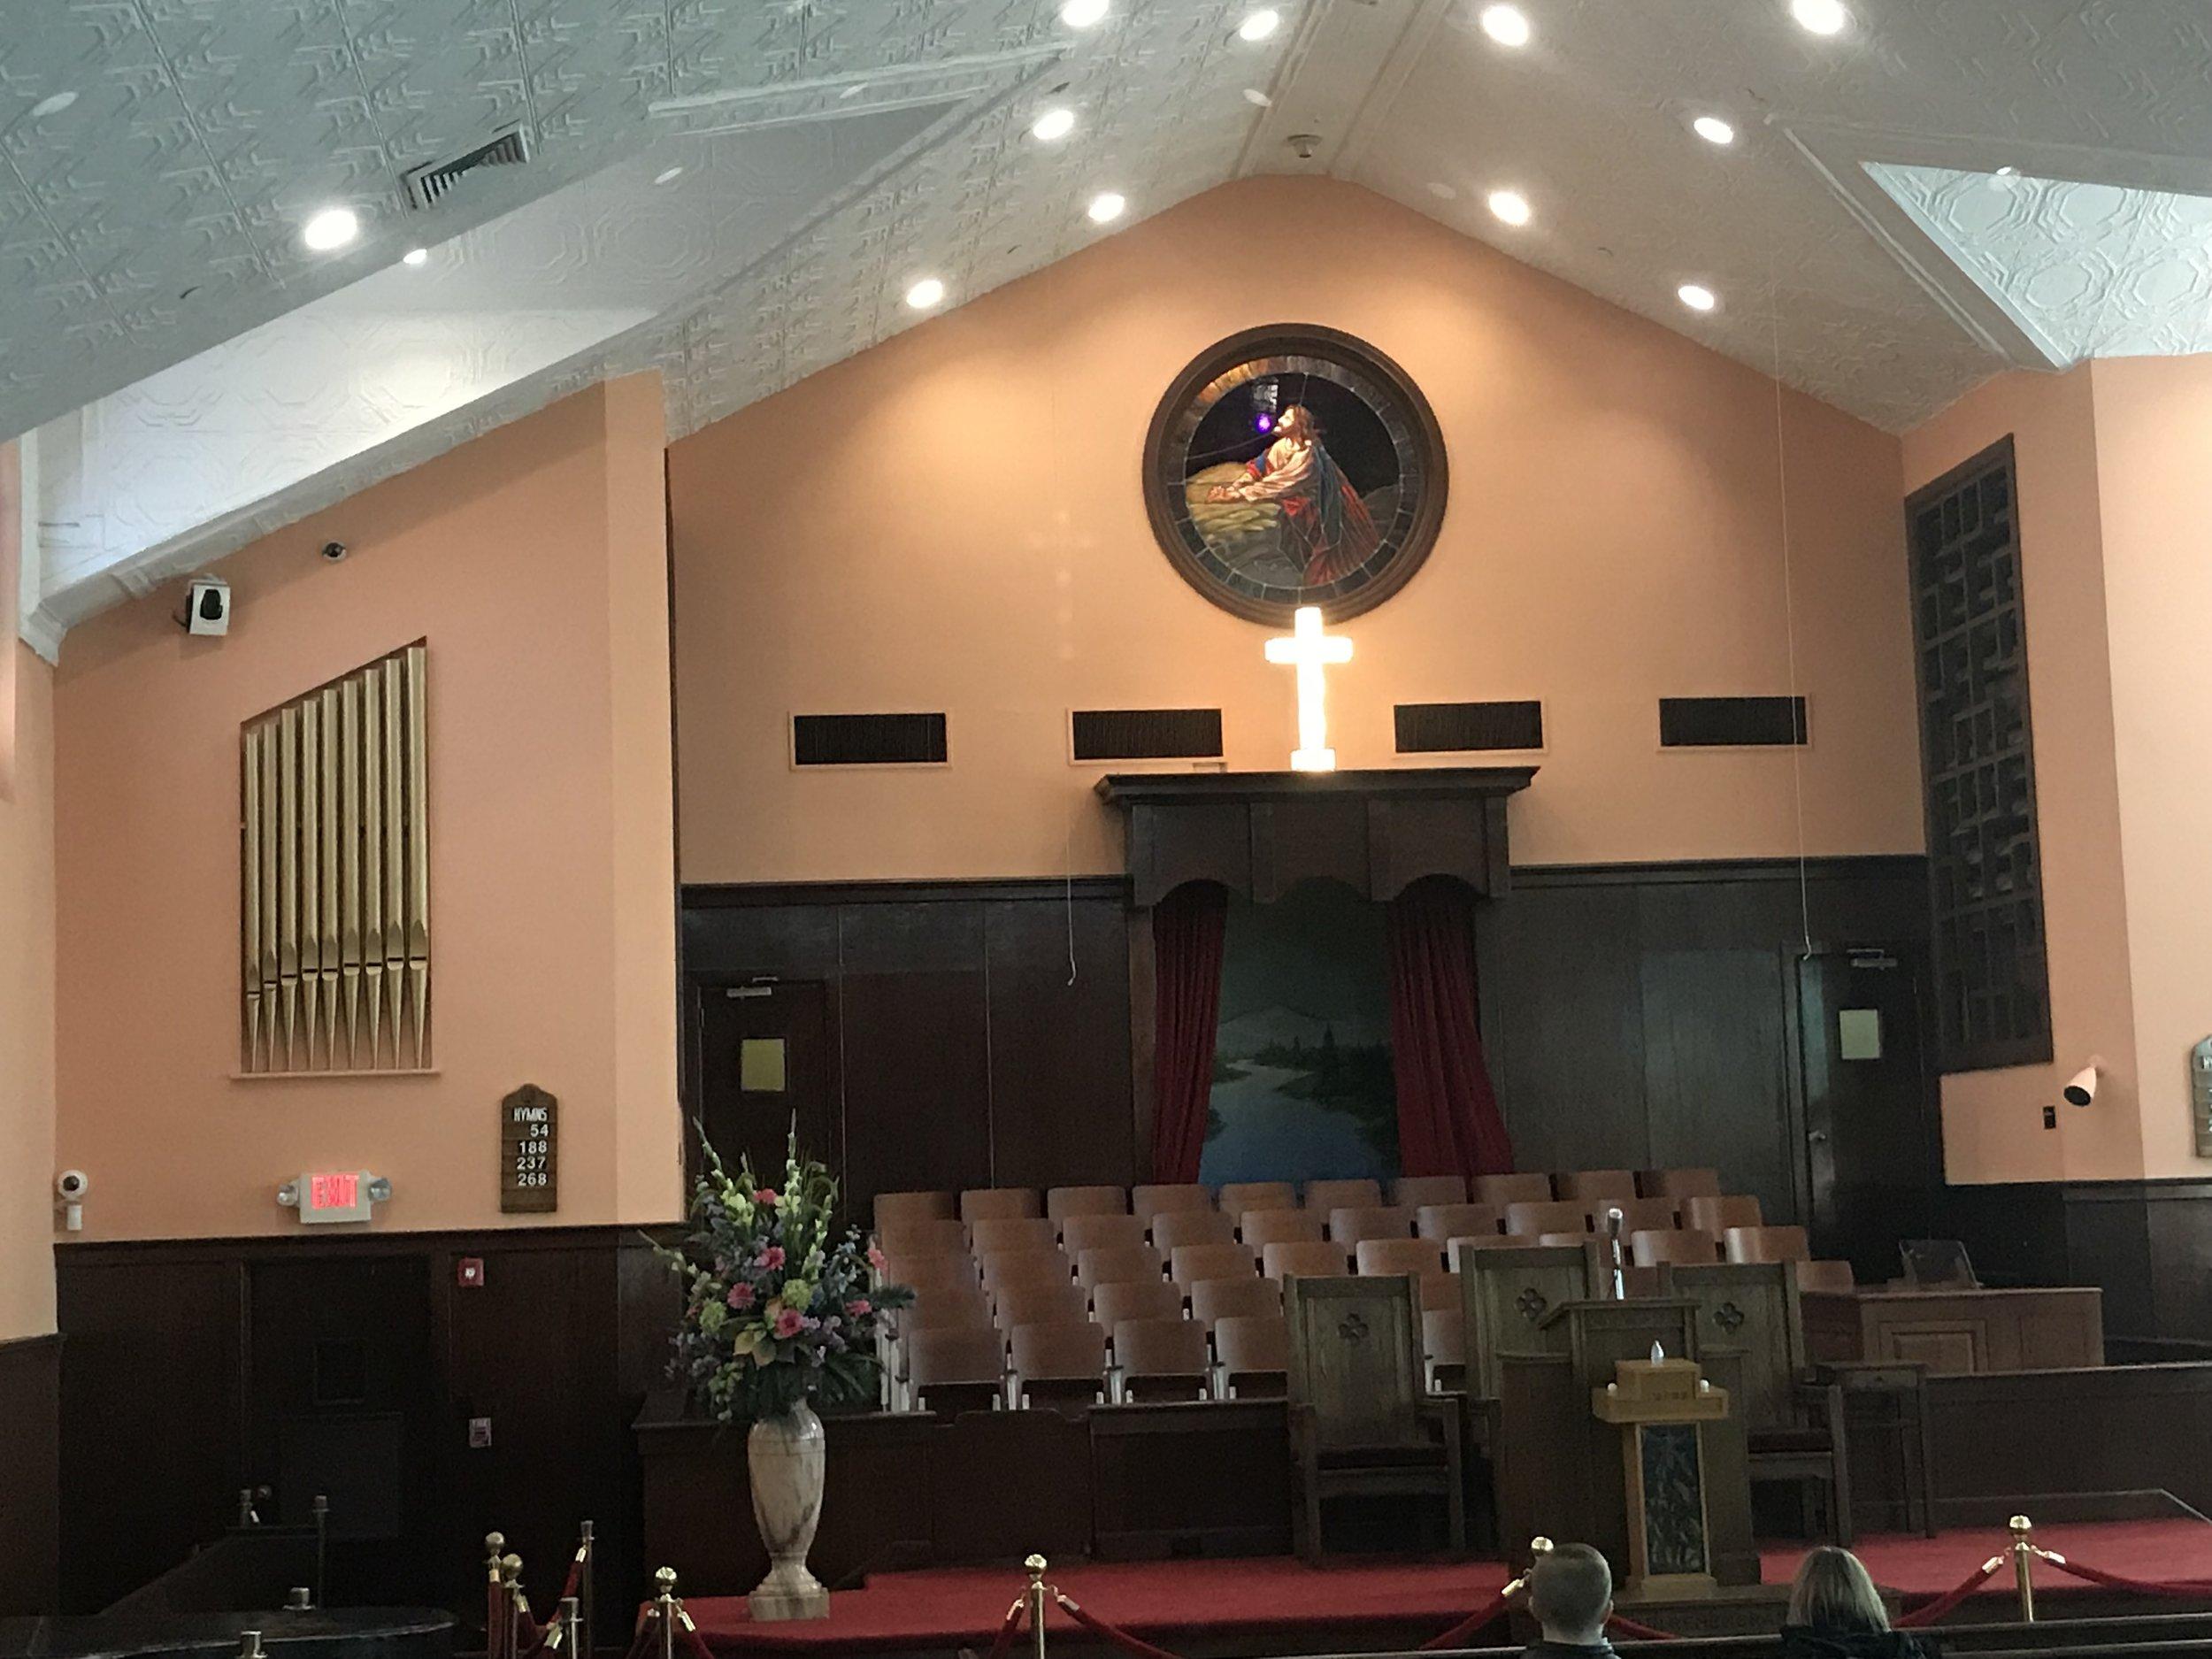 Inside the Ebenezer Baptist Church in Atlanta.